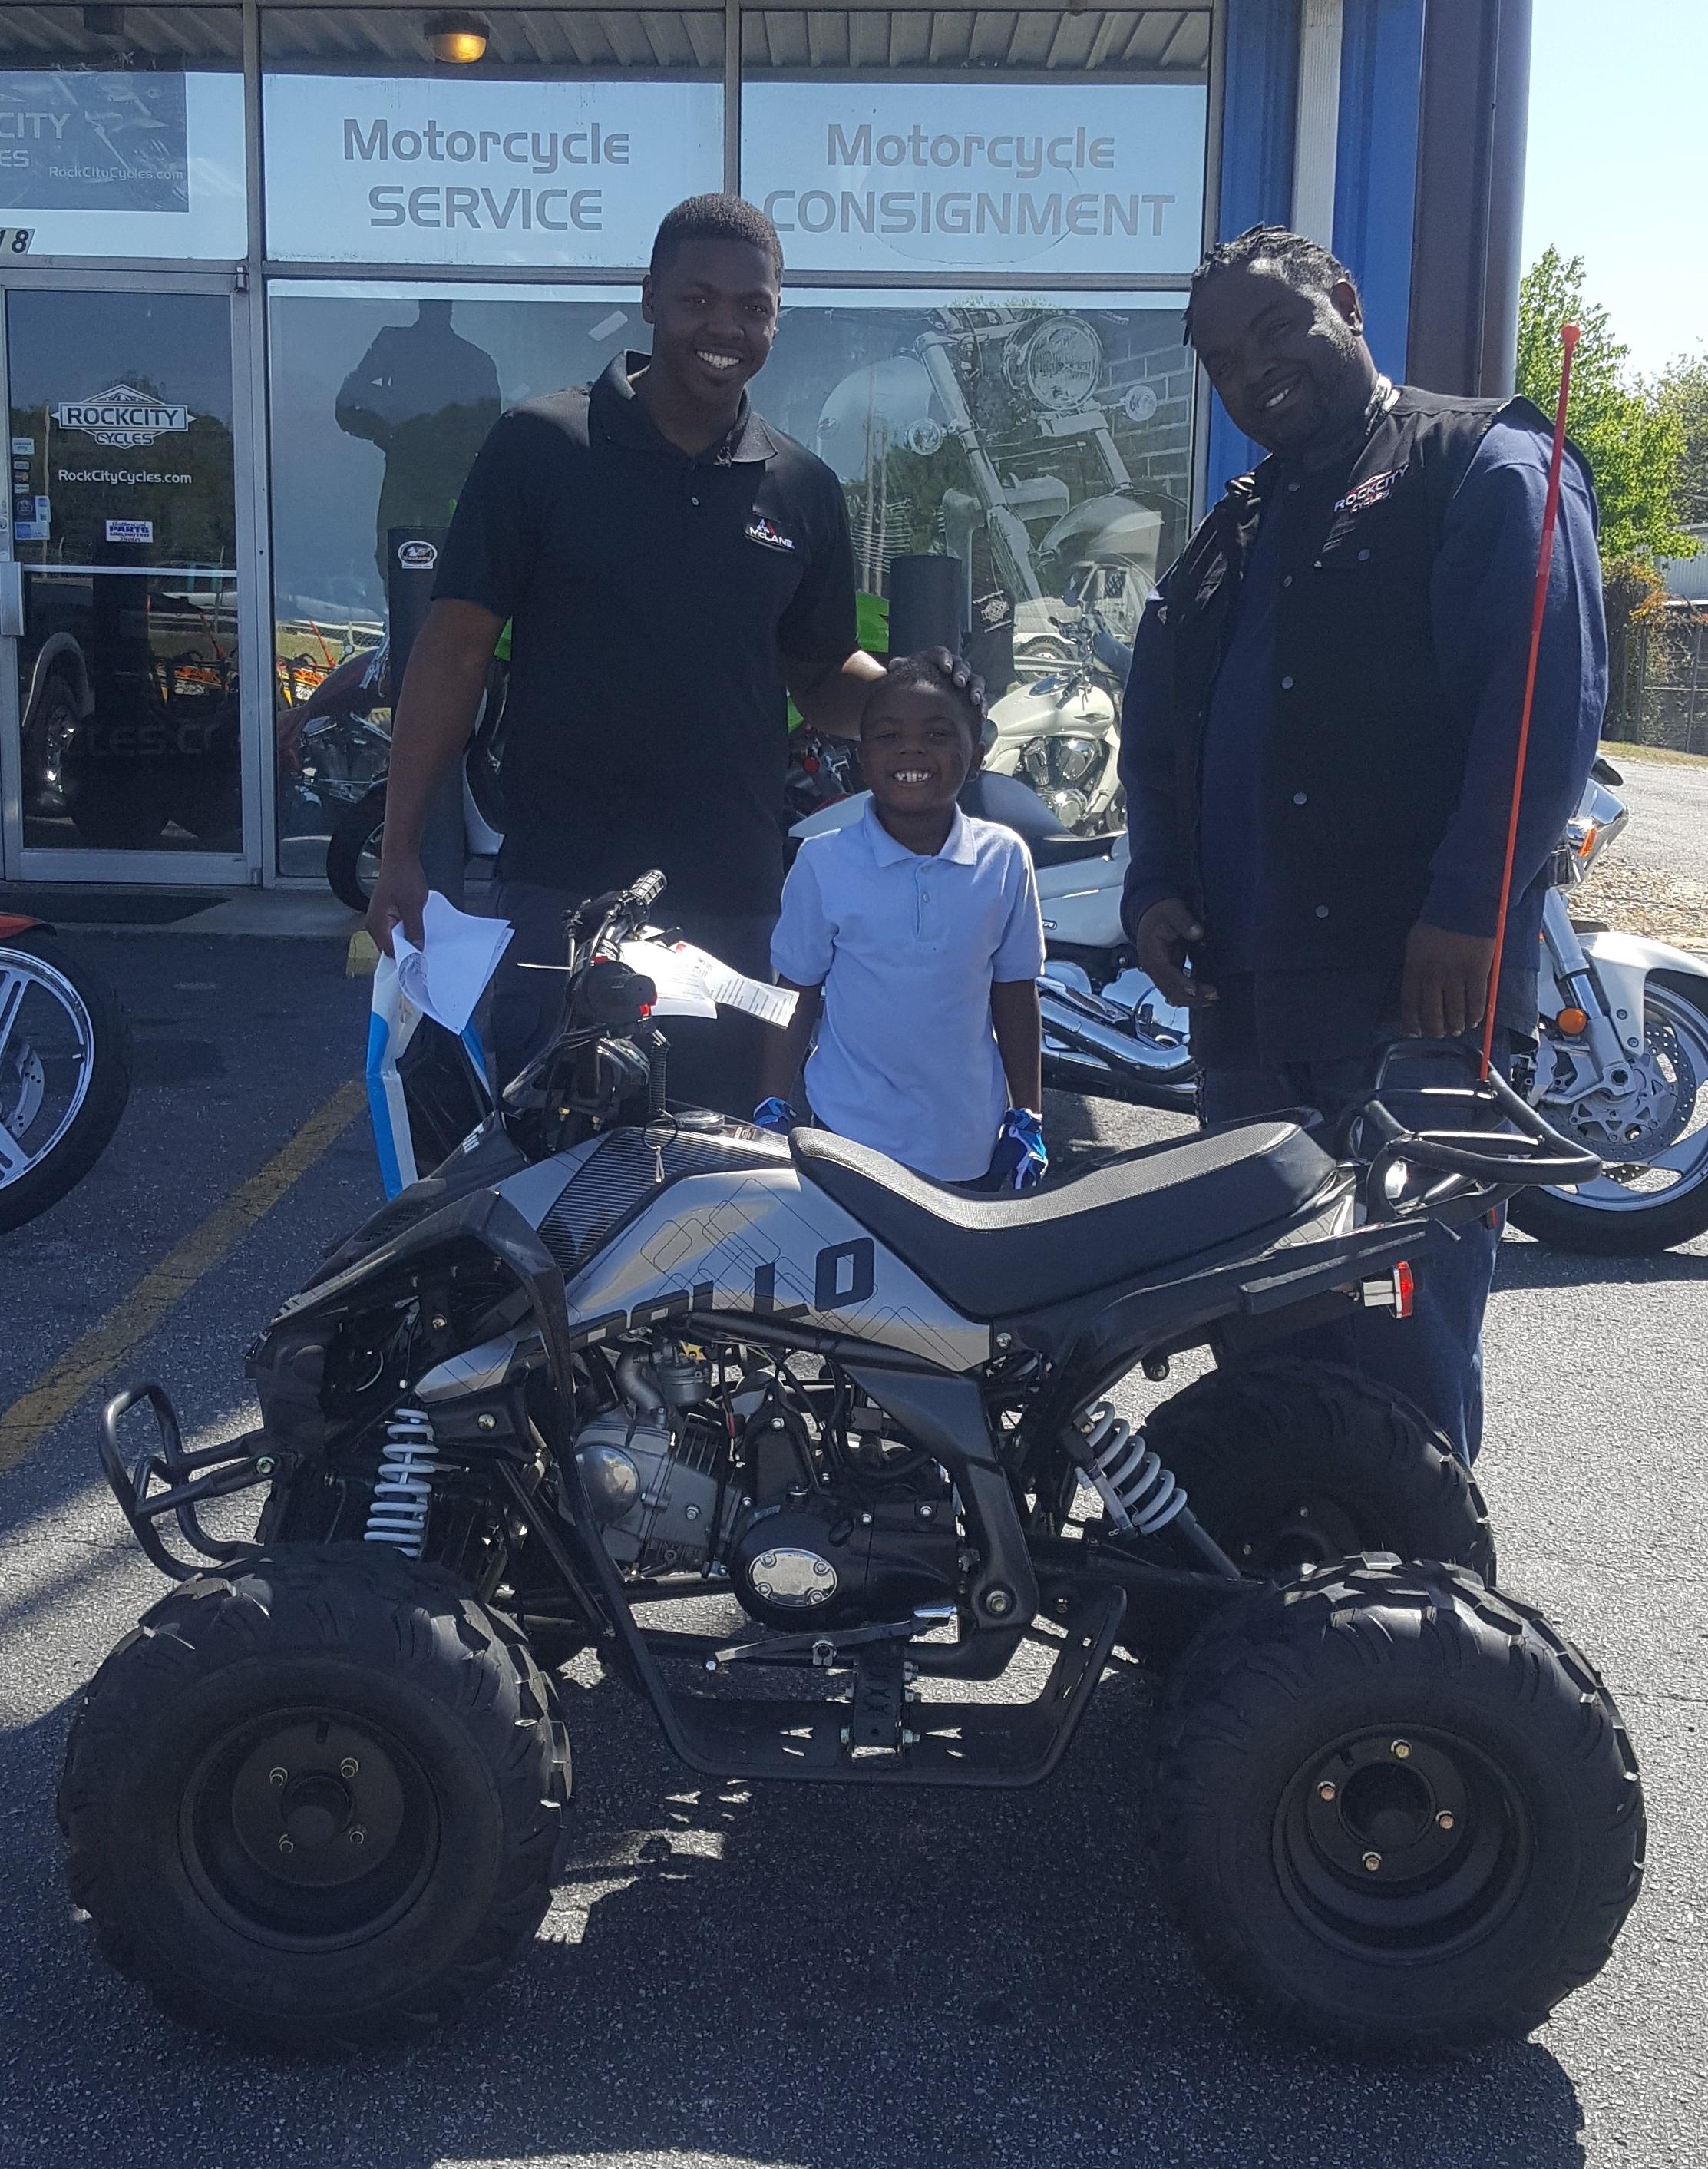 Bryan S. with his 2017 Apollo Blazer 125cc ATV